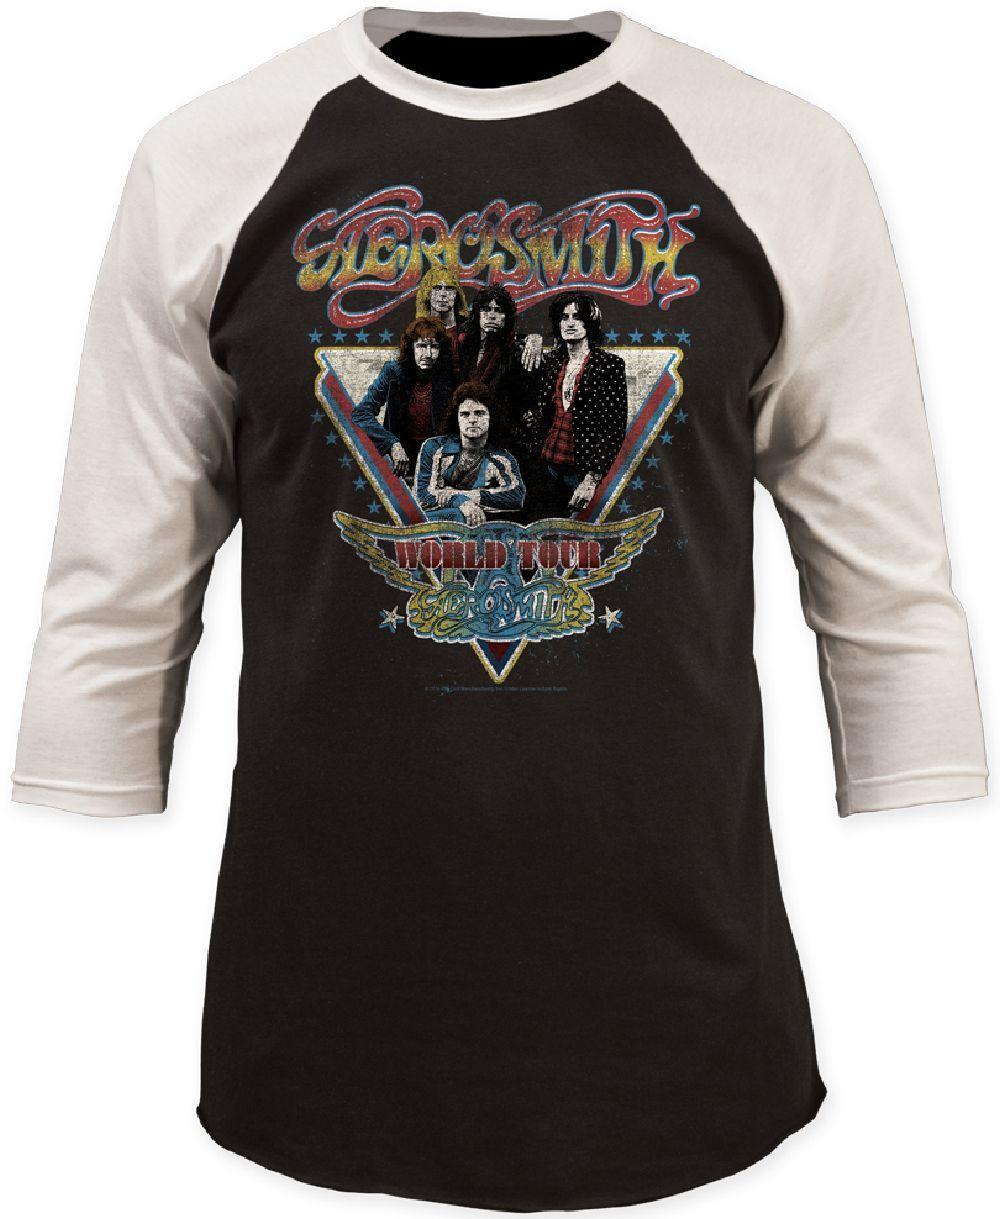 Aerosmith Concert T Shirt Aerosmith World Tour Vintage Baseball Jersey Concert Tshirts Tour T Shirts Baseball Tee Shirts